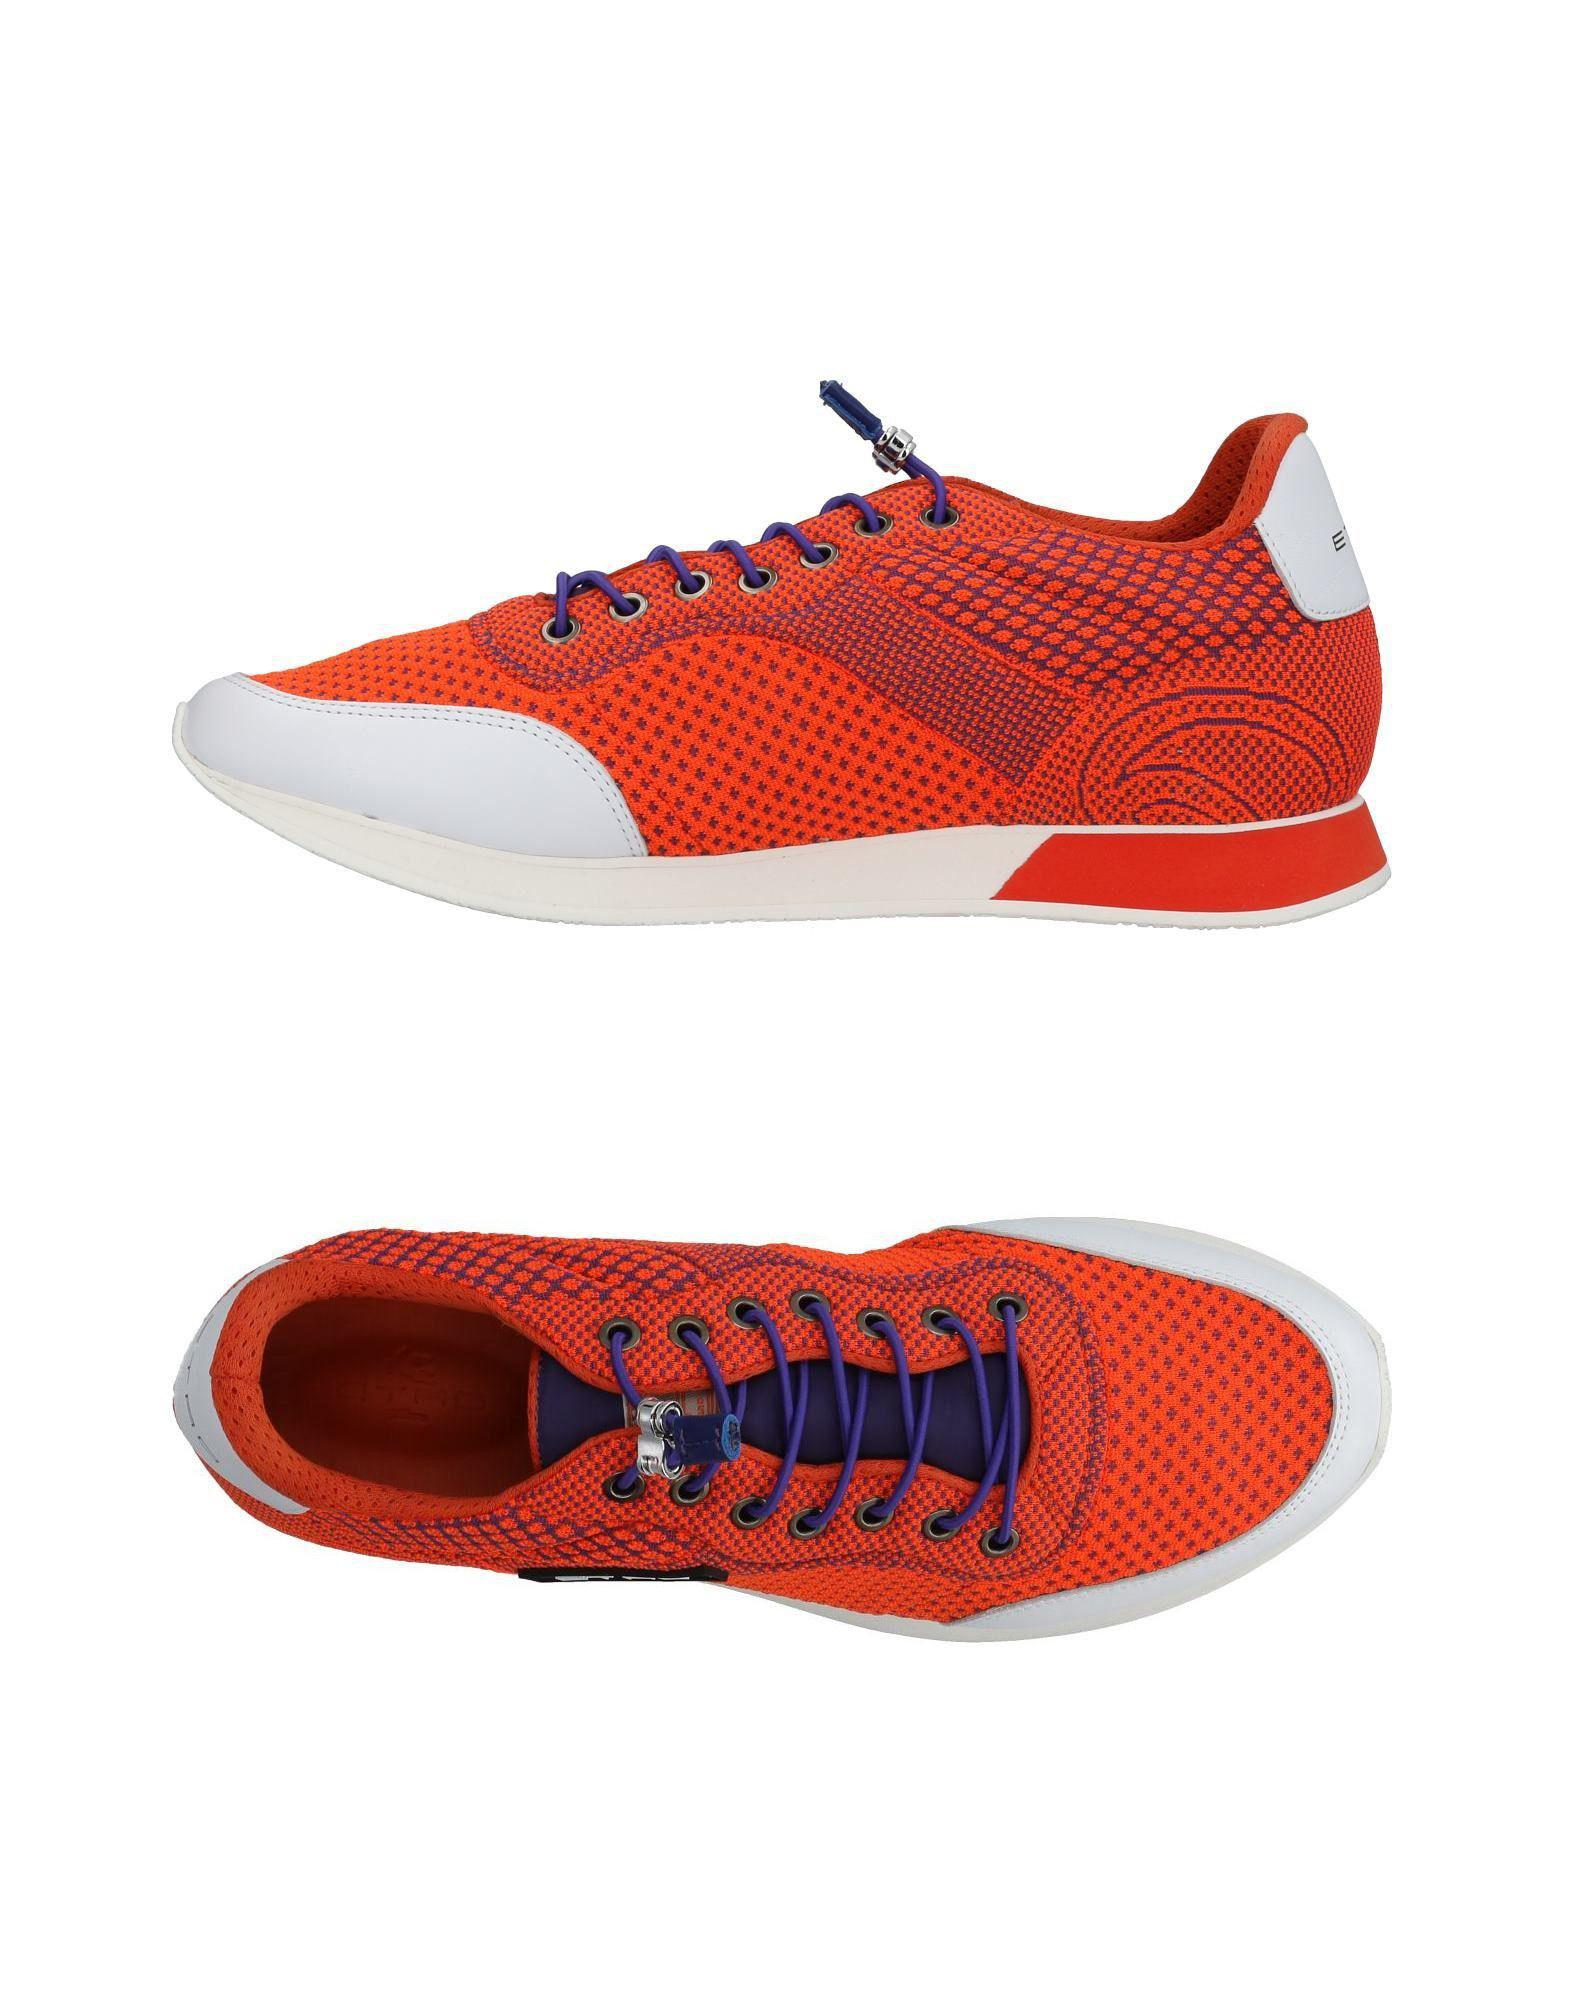 Etro Bas-tops Et Chaussures De Sport ZCYZV4z